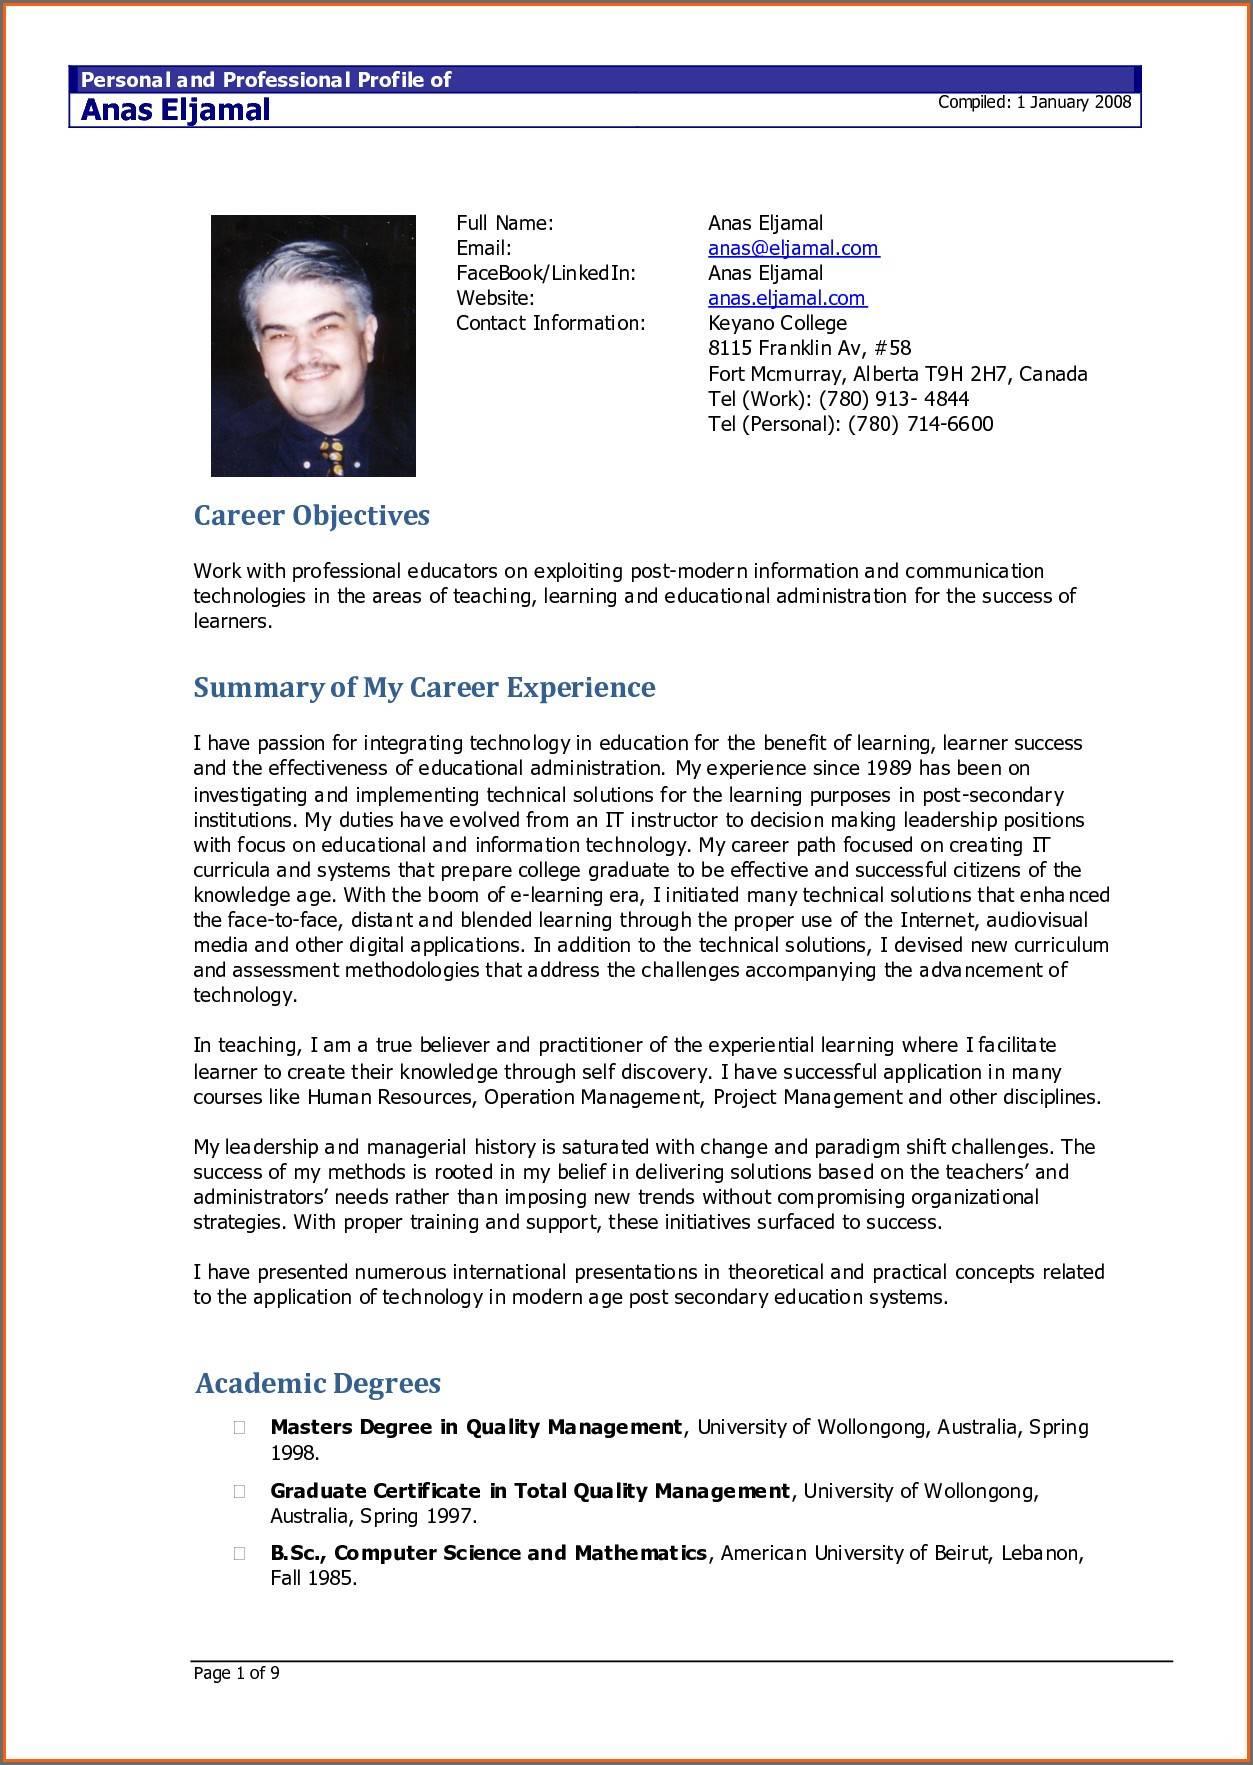 Resume Cv Template Doc